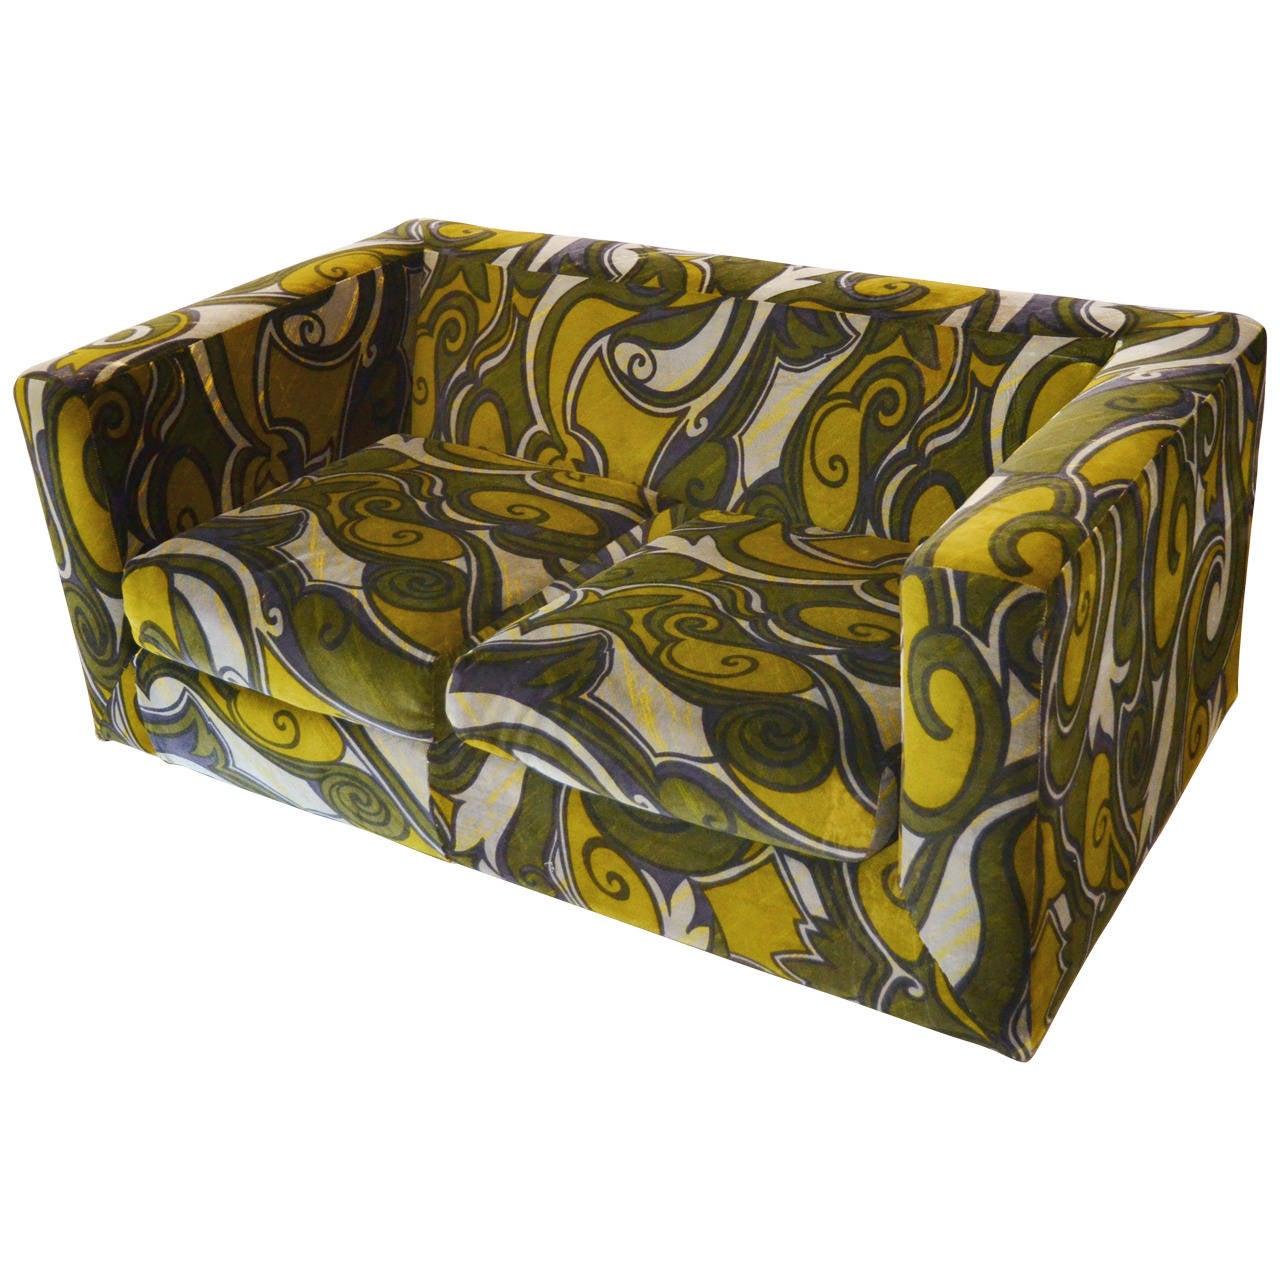 dunbar loveseat with jack lenor larsen velvet at 1stdibs. Black Bedroom Furniture Sets. Home Design Ideas